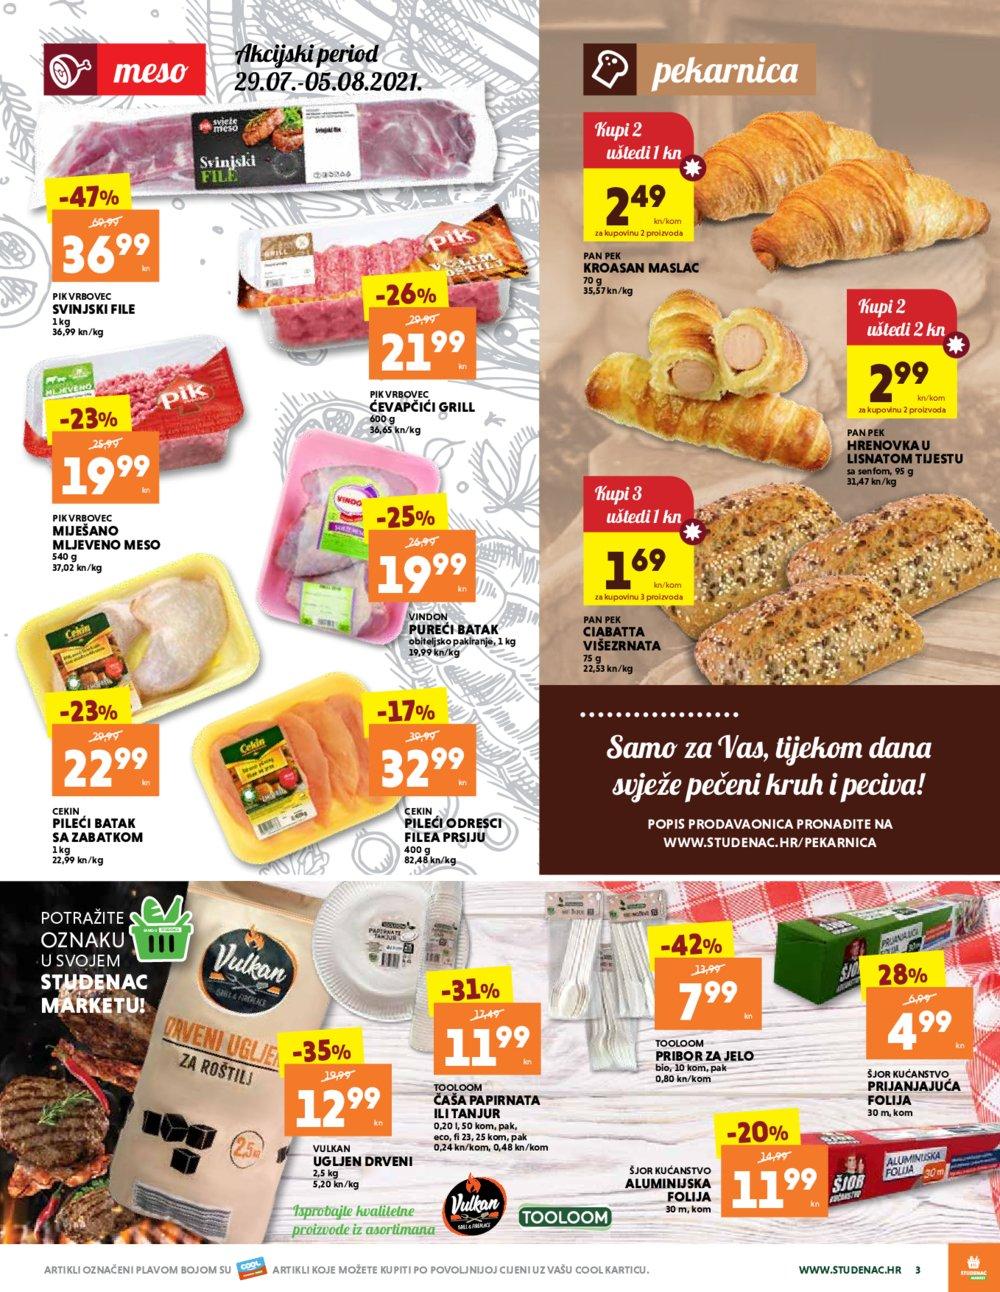 Studenac Jadran katalog Akcija 29.07.-11.08.